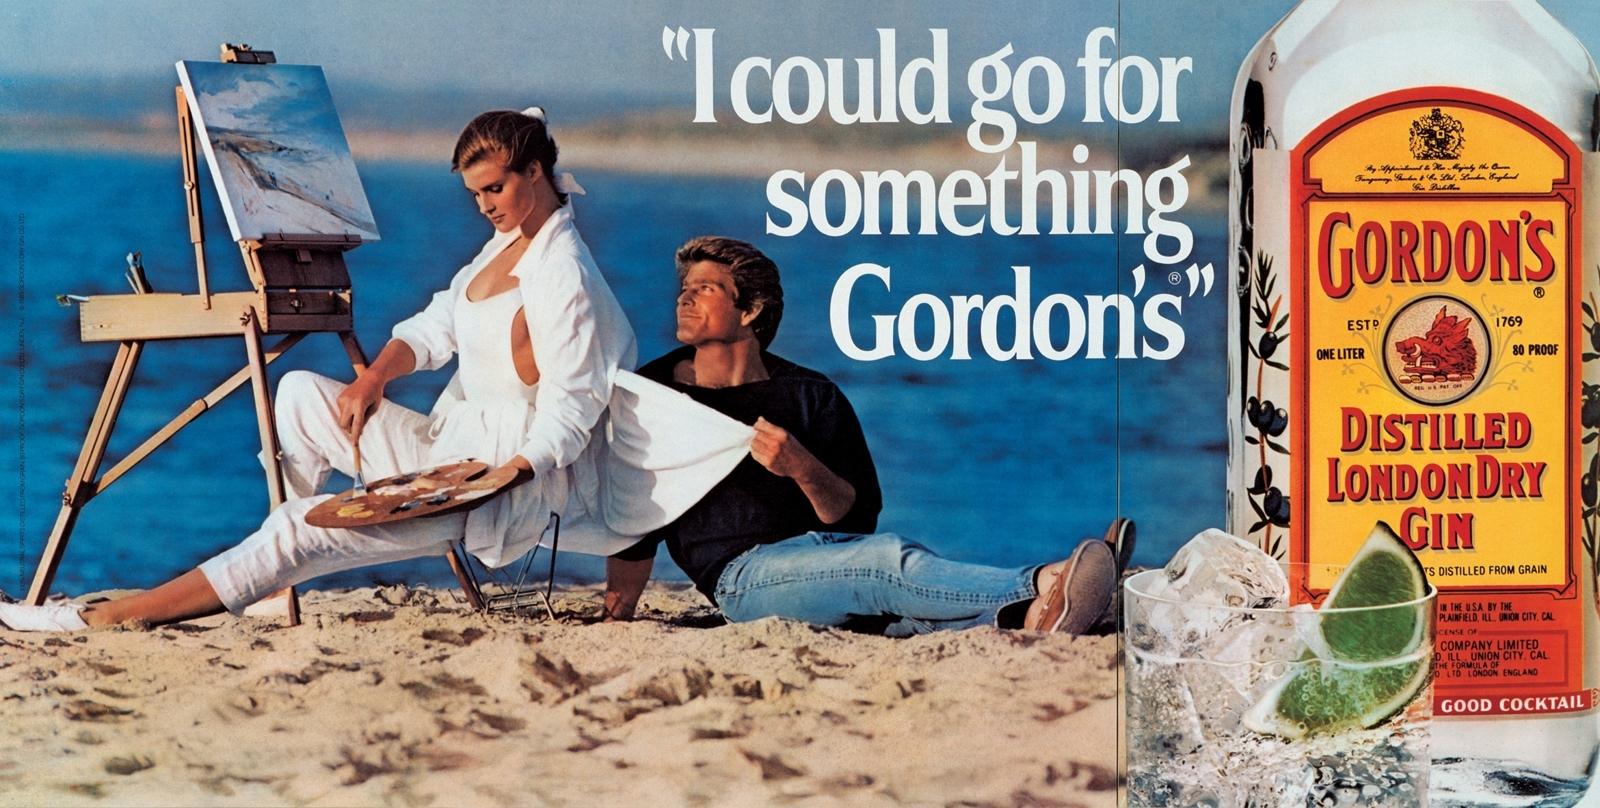 I Could Go For Something Gordon's image